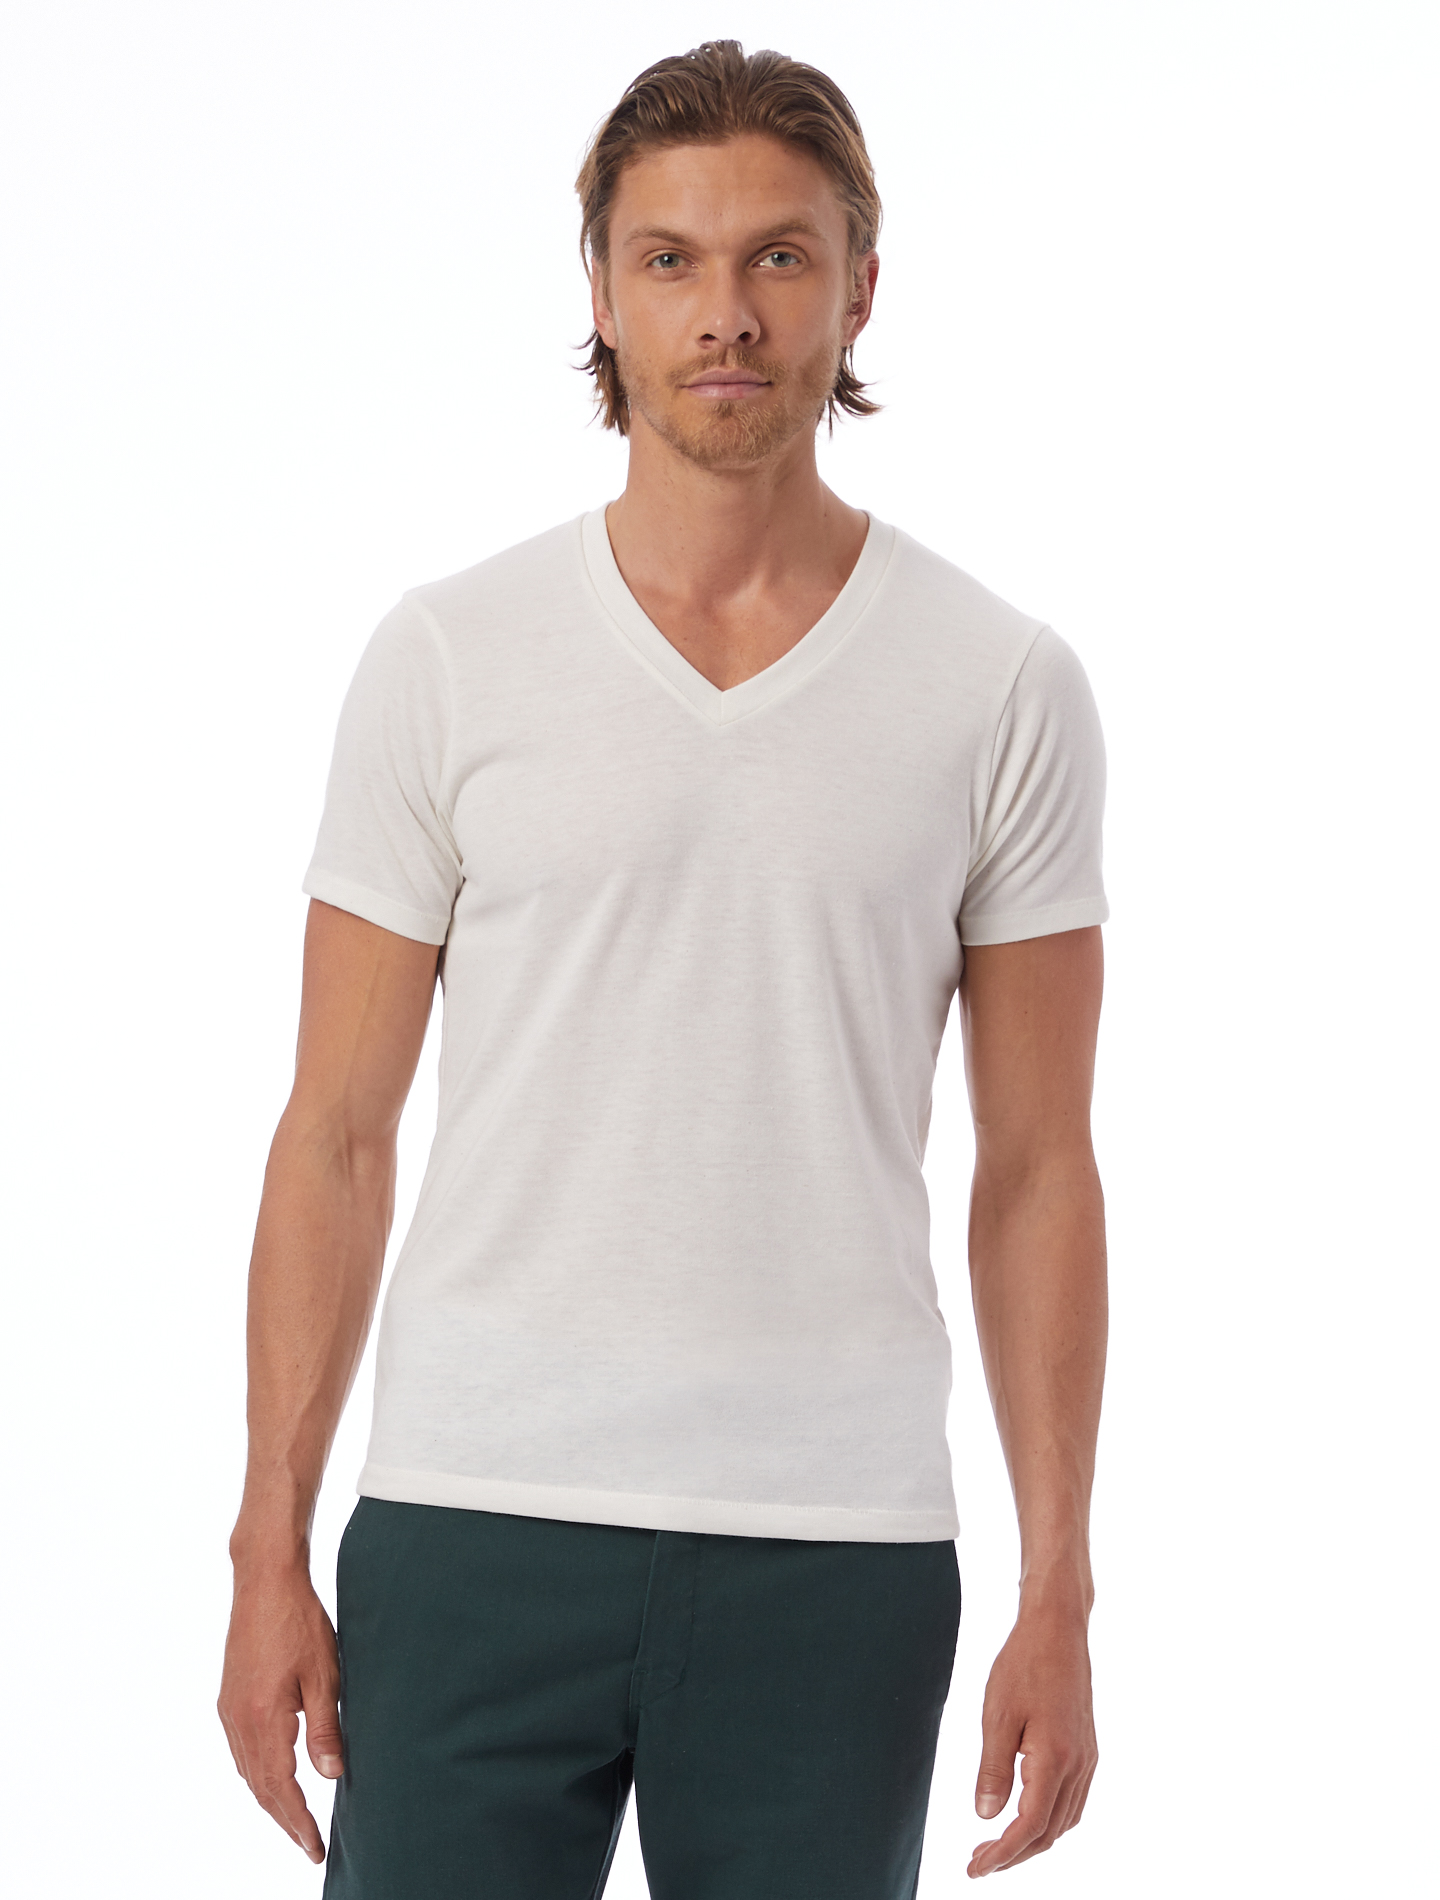 alternative apparel boss v neck eco jersey t shirt ebay